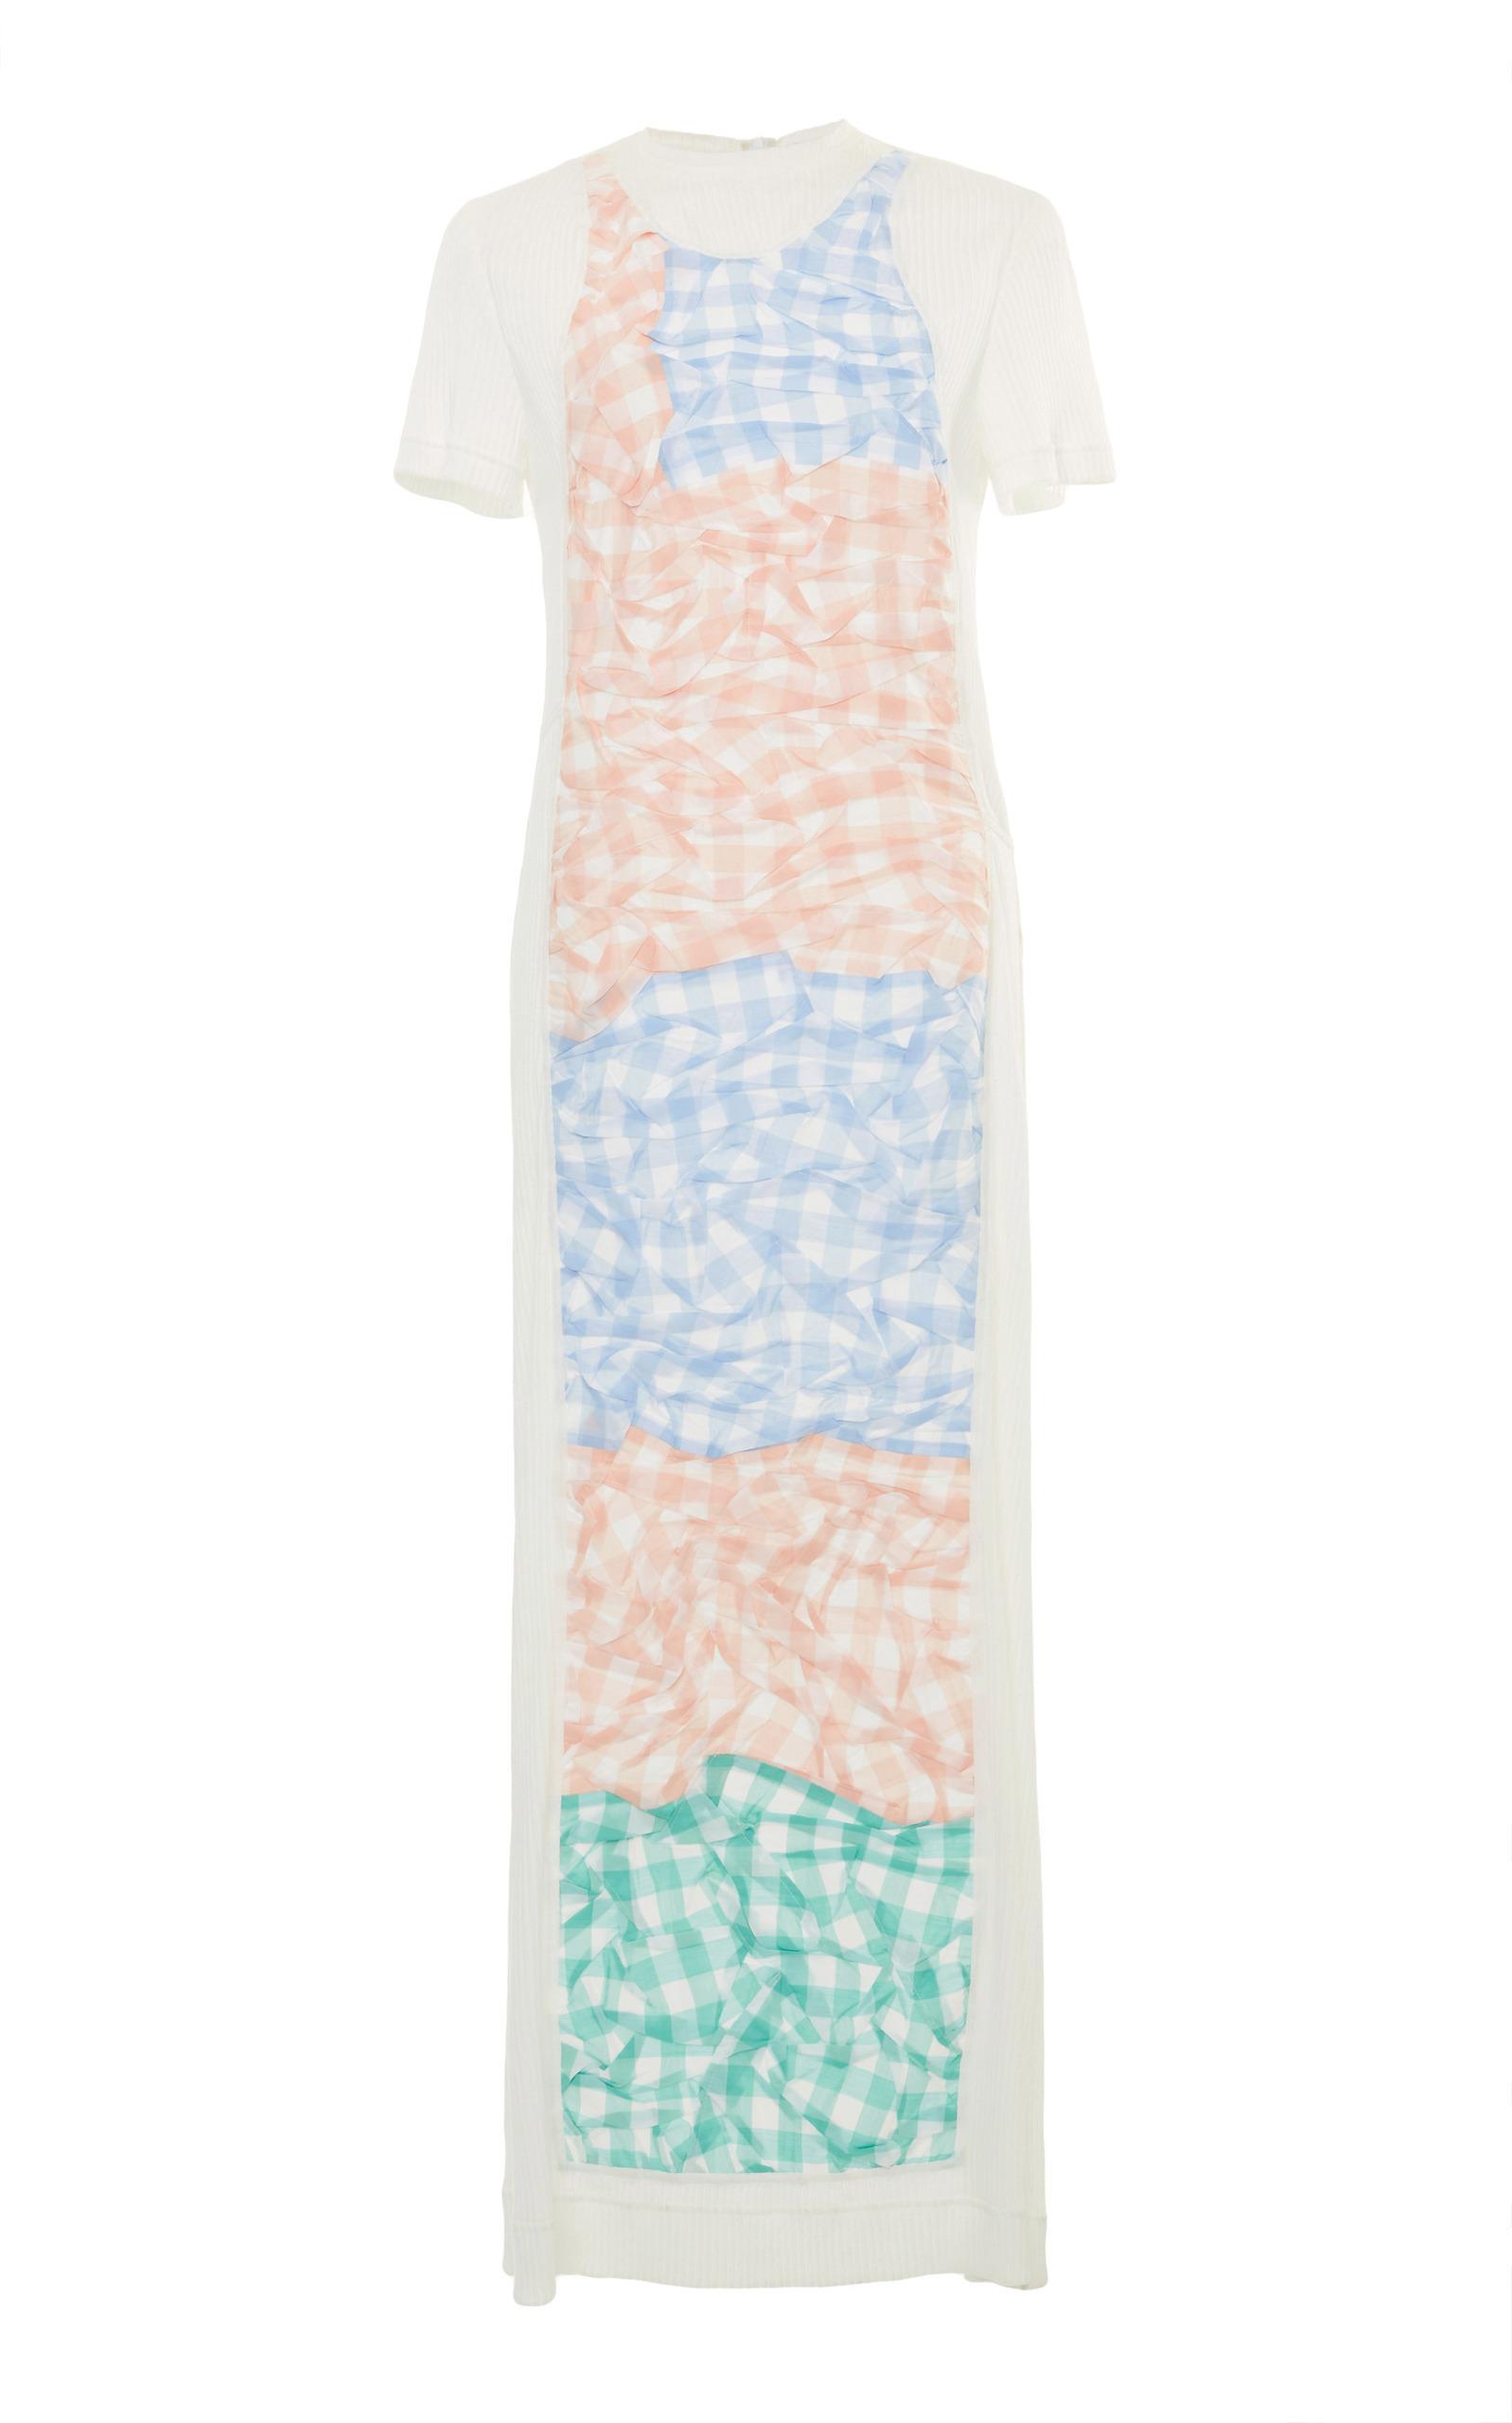 Loewe Gingham Patchwork Shirt Dress In Plaid